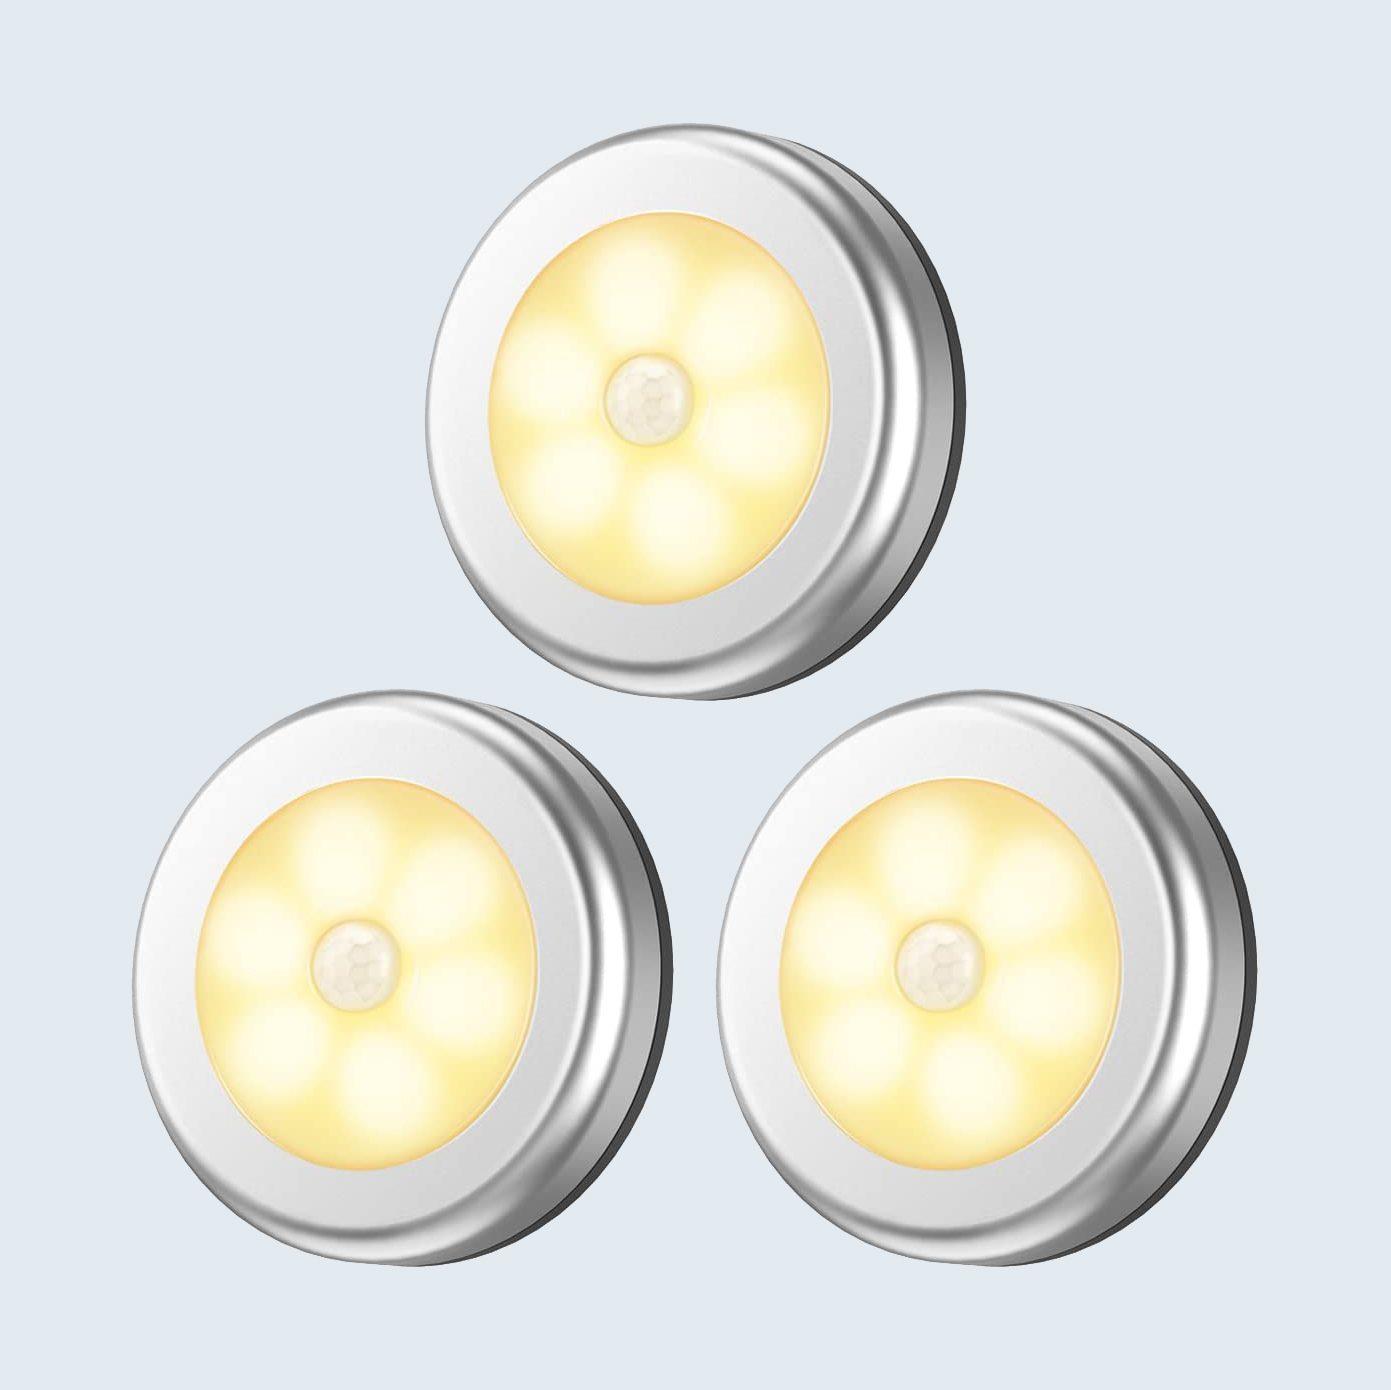 Amir Motion Sensor Lights for inside the closet